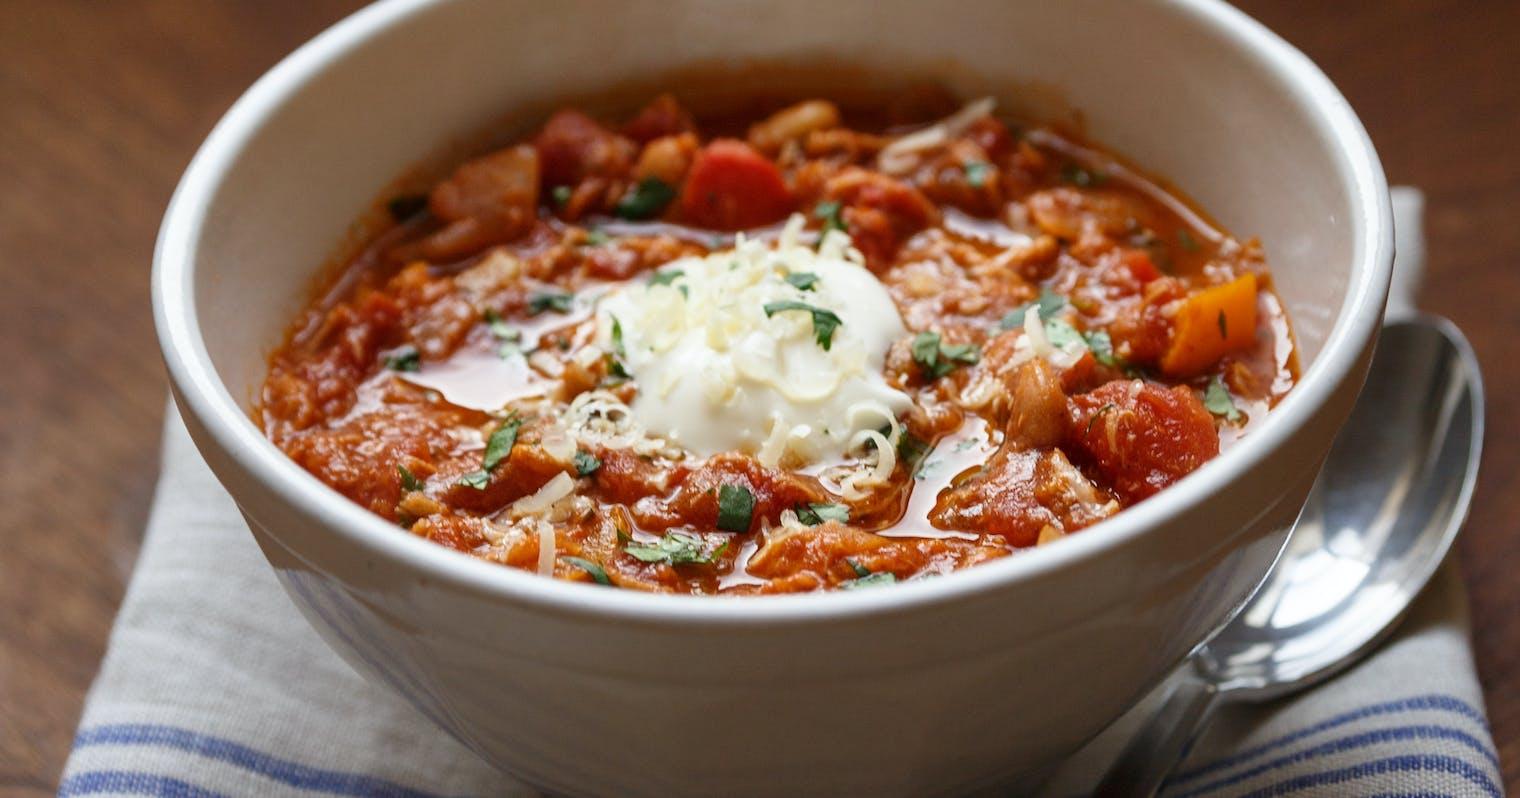 Best White Bean Chicken Chili Recipe The Yellow Table